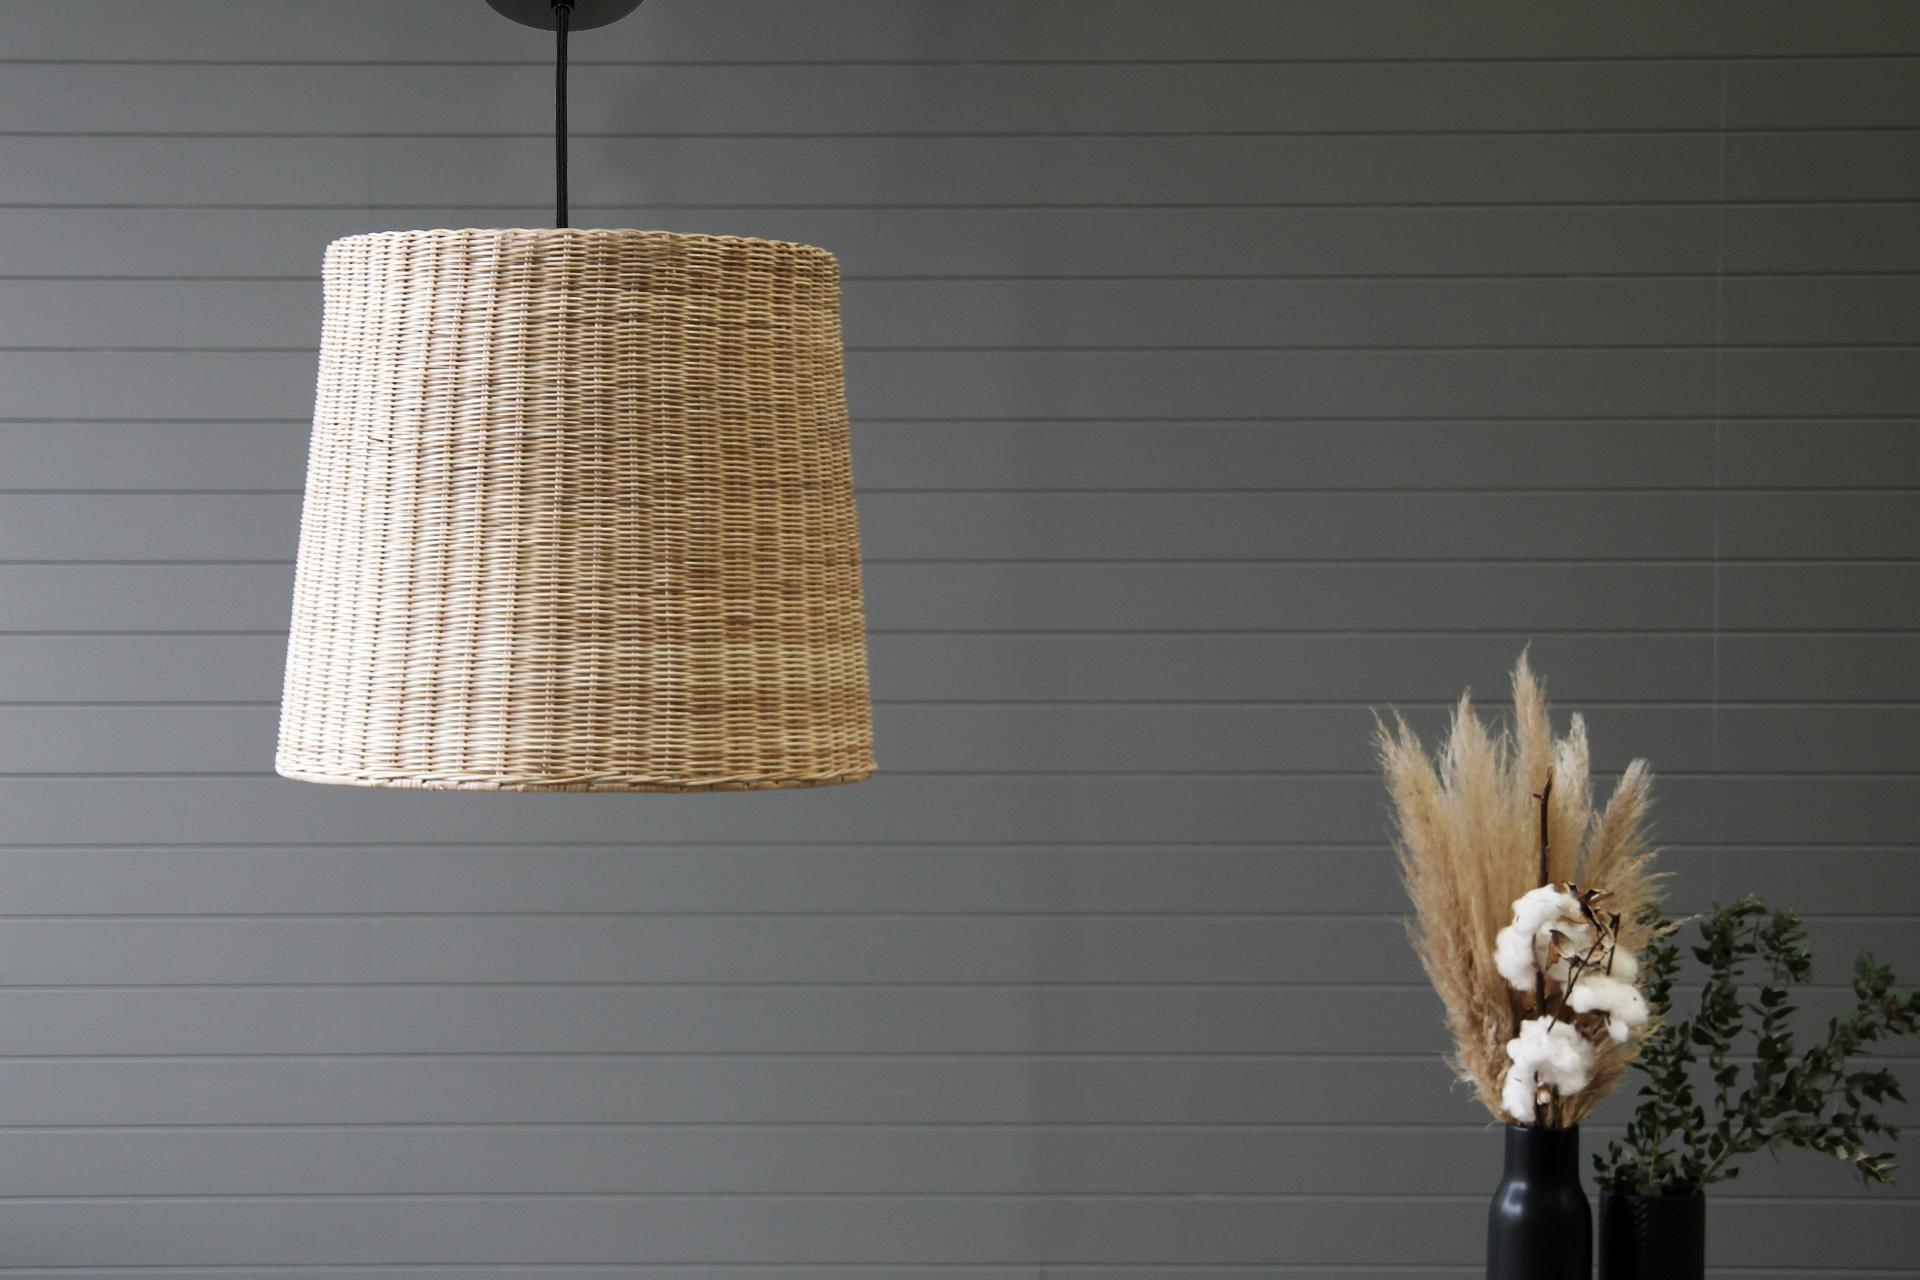 Rattan Bell Pendant Light Shade - Small